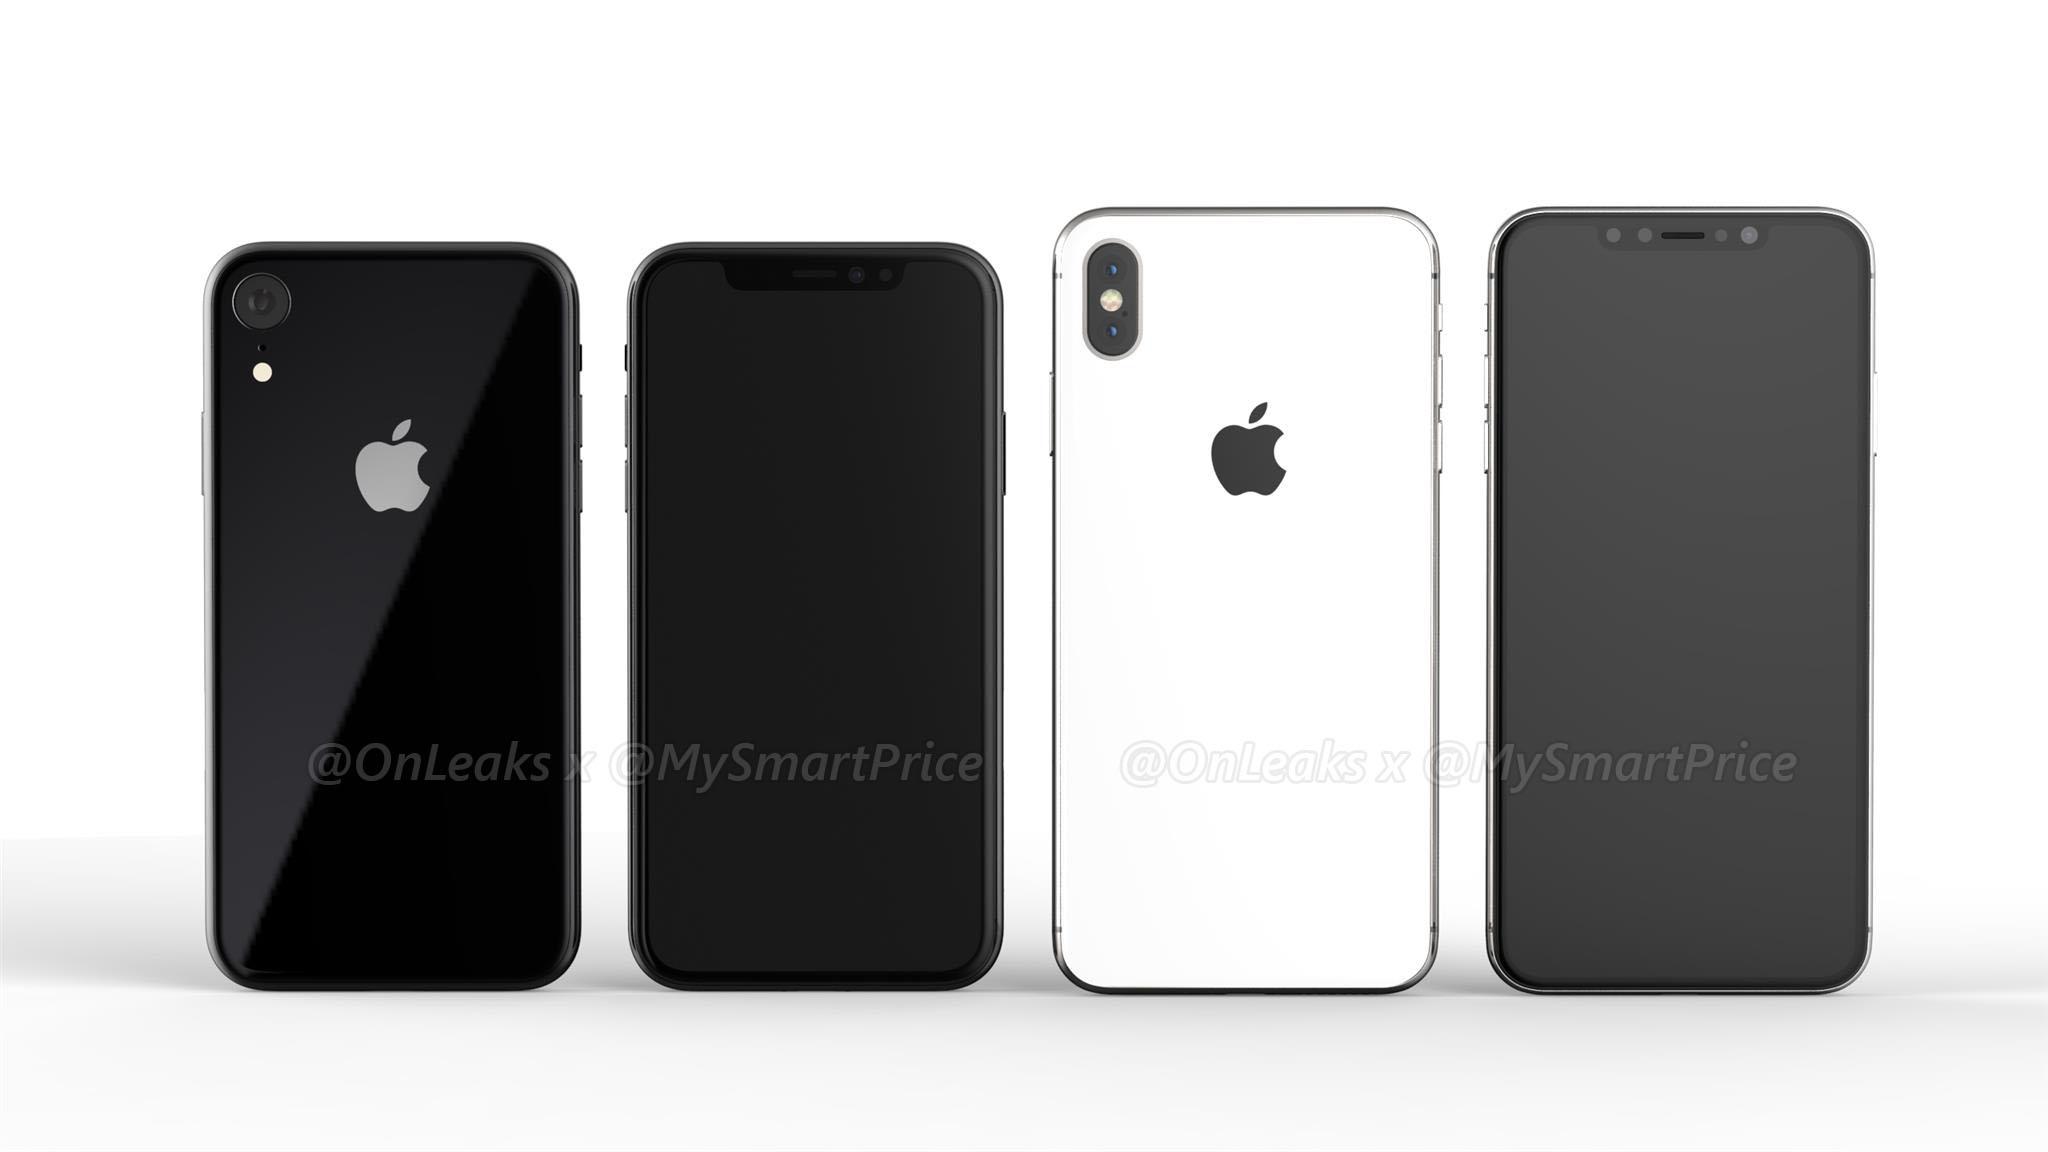 iPhone(2018)/iPhone X Plusのレンダー動画登場。サイズも明らかに